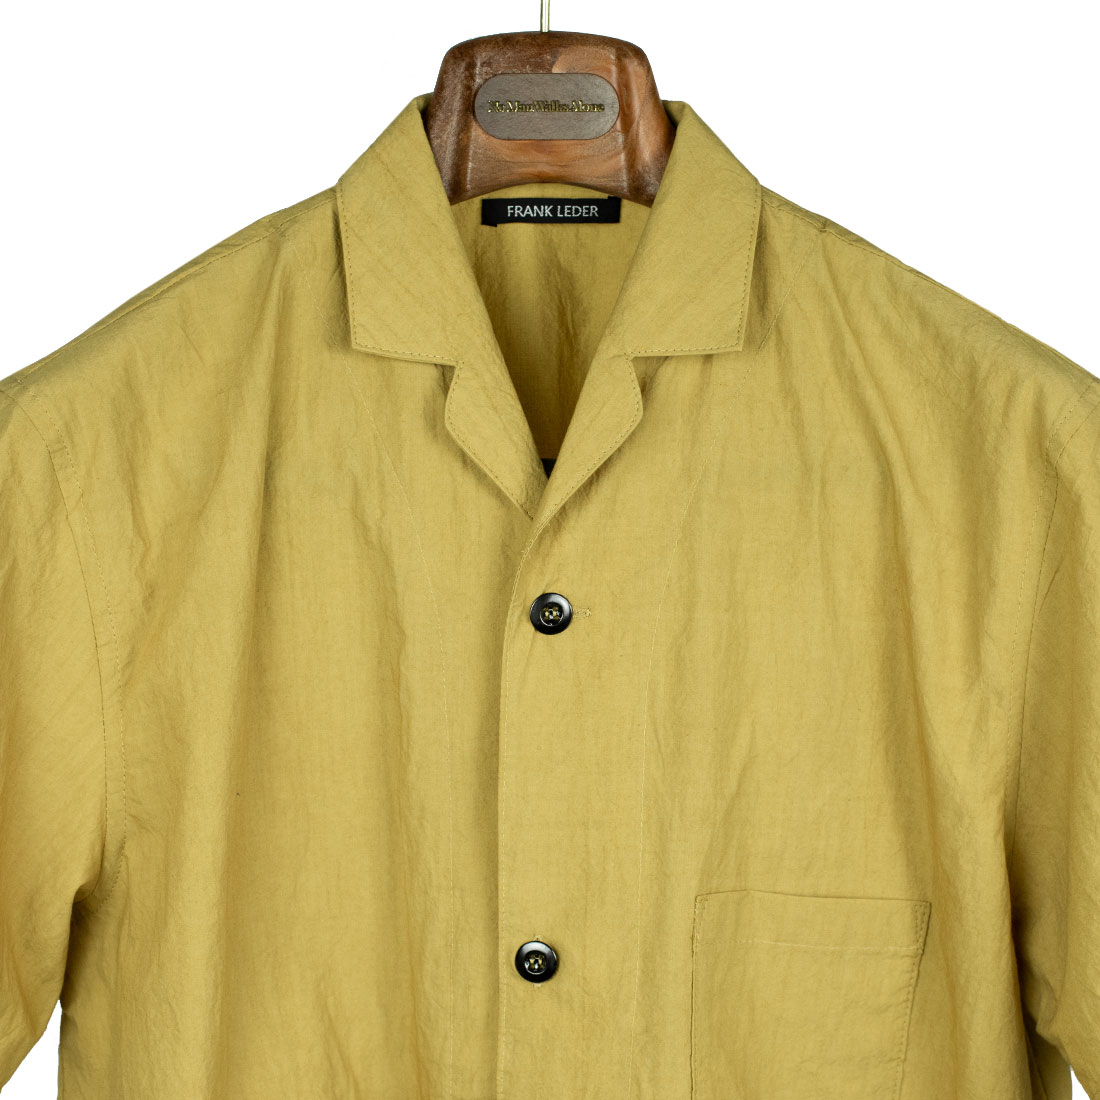 Frank Leder Spring Summer 2021 SS21 Made in Germany lightweight camp shirt (16).jpg